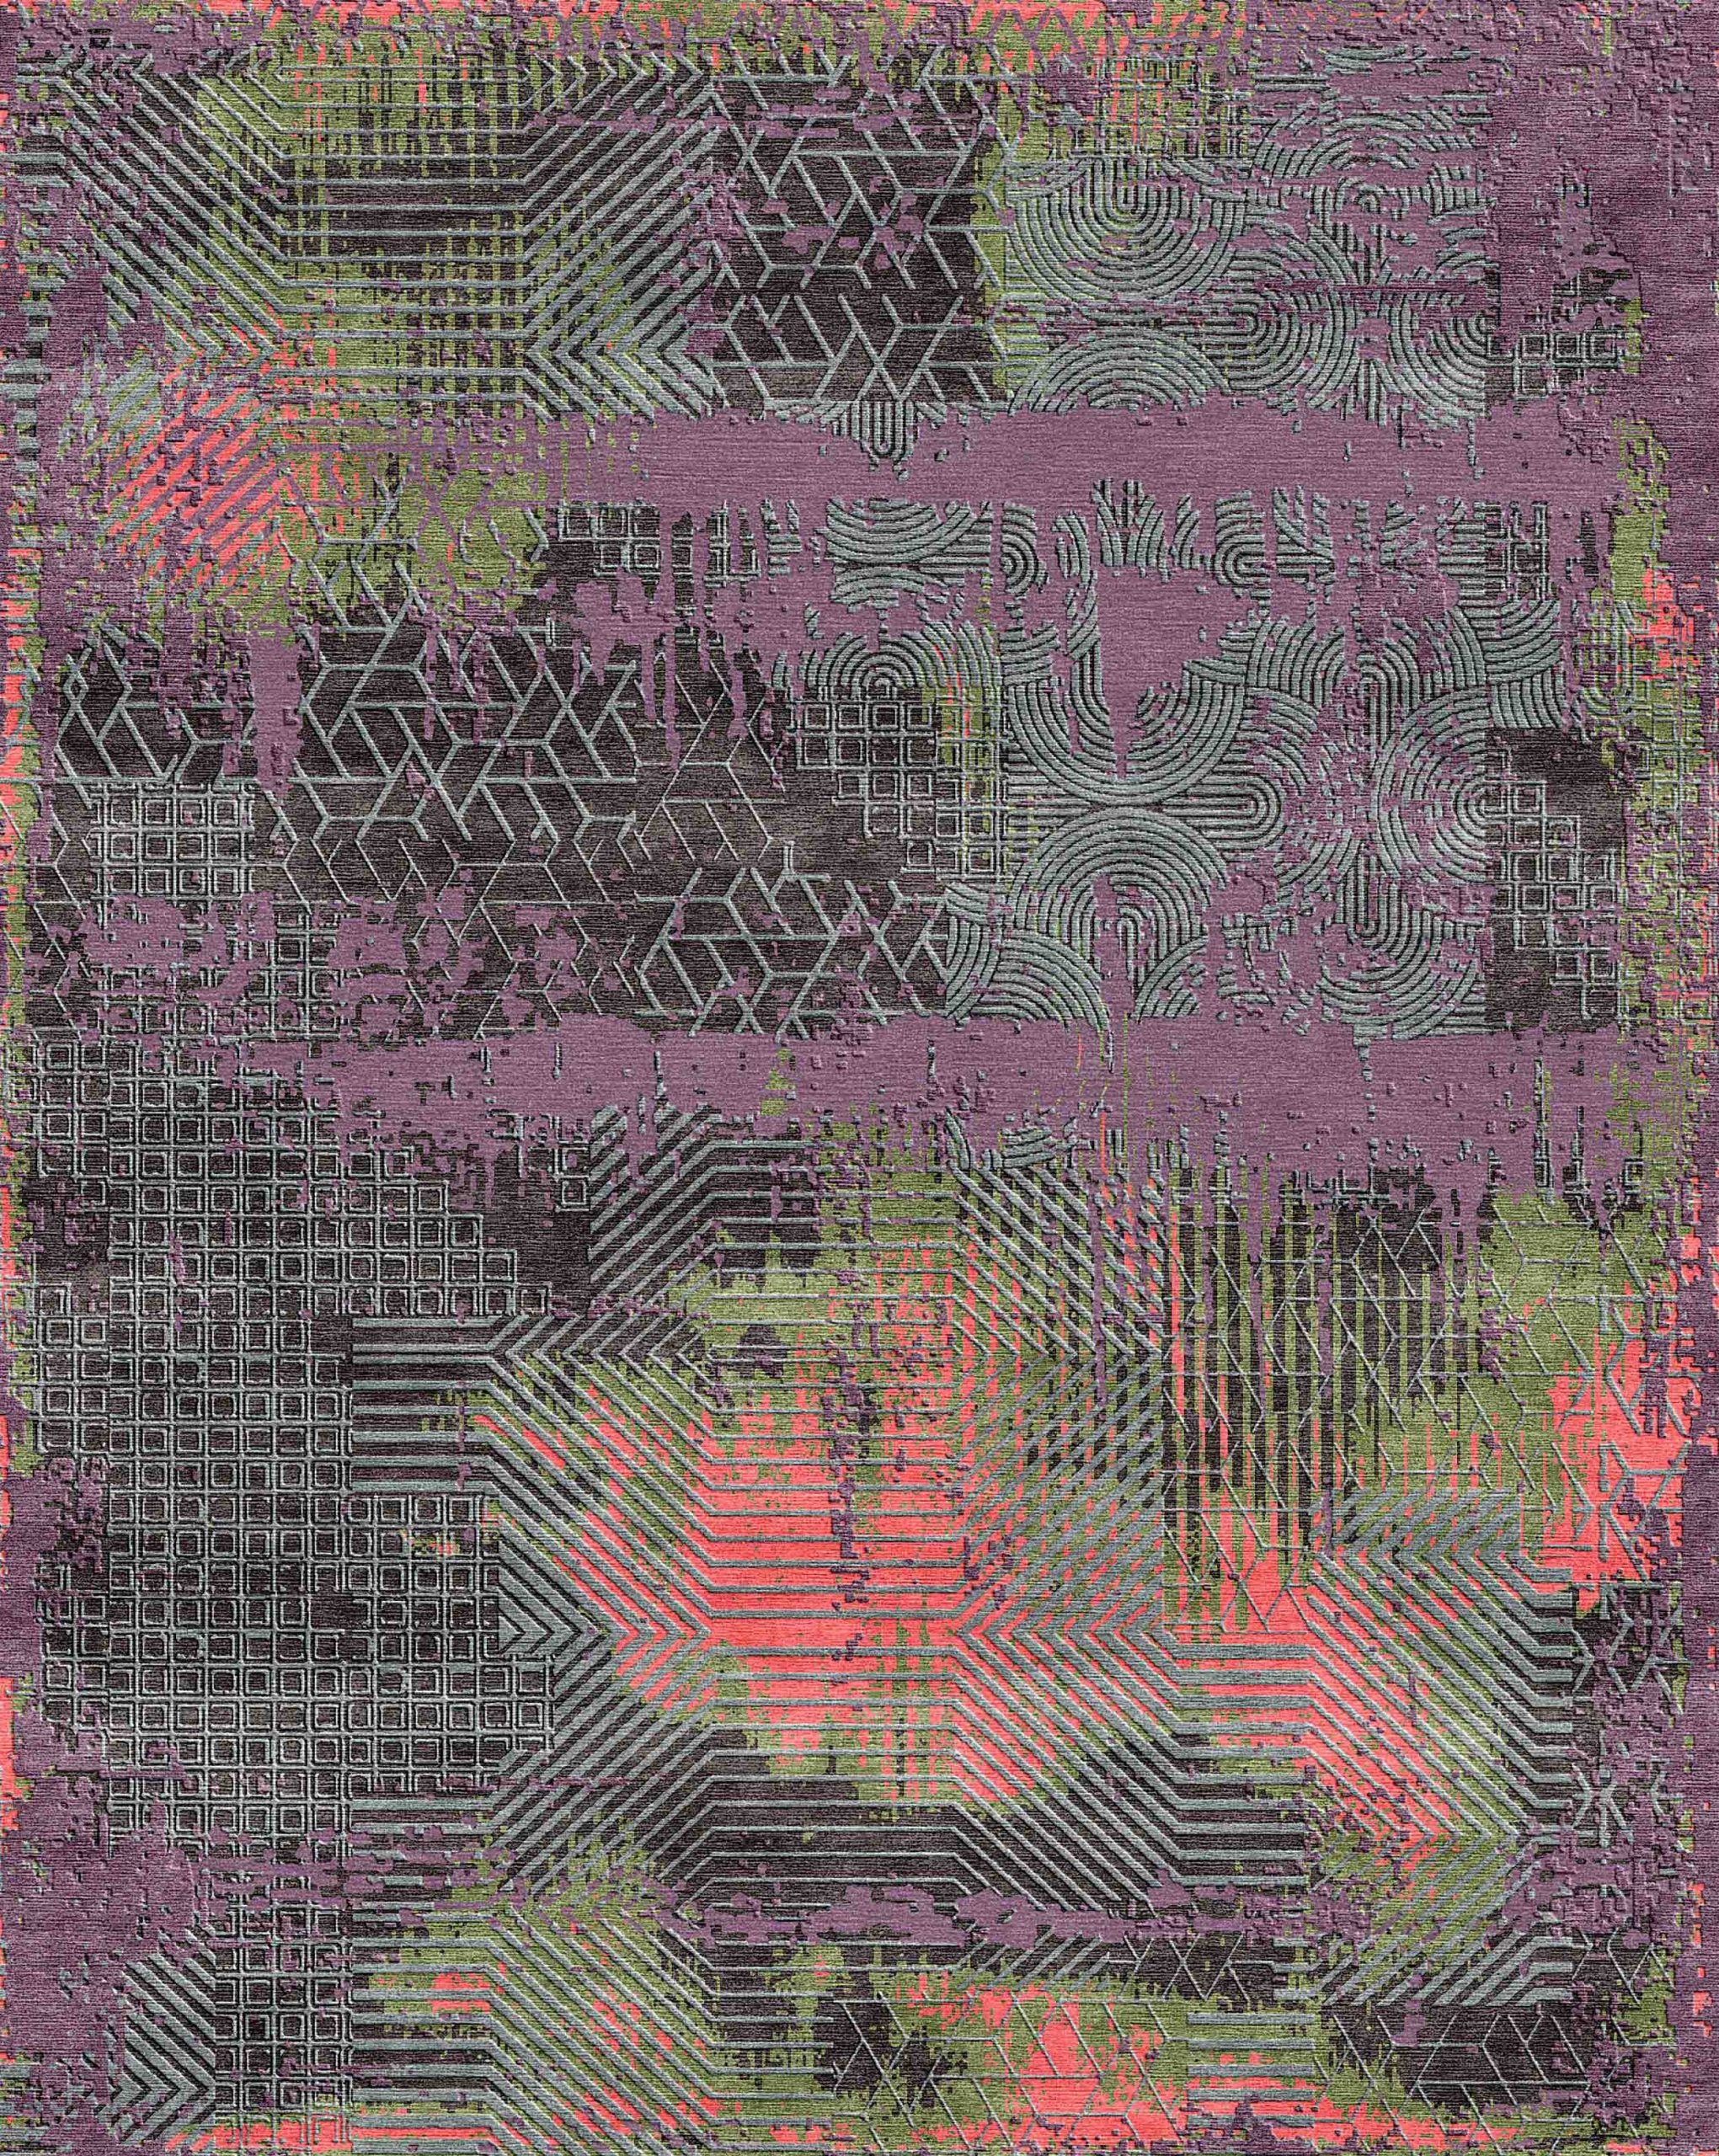 Source: Hands Carpets